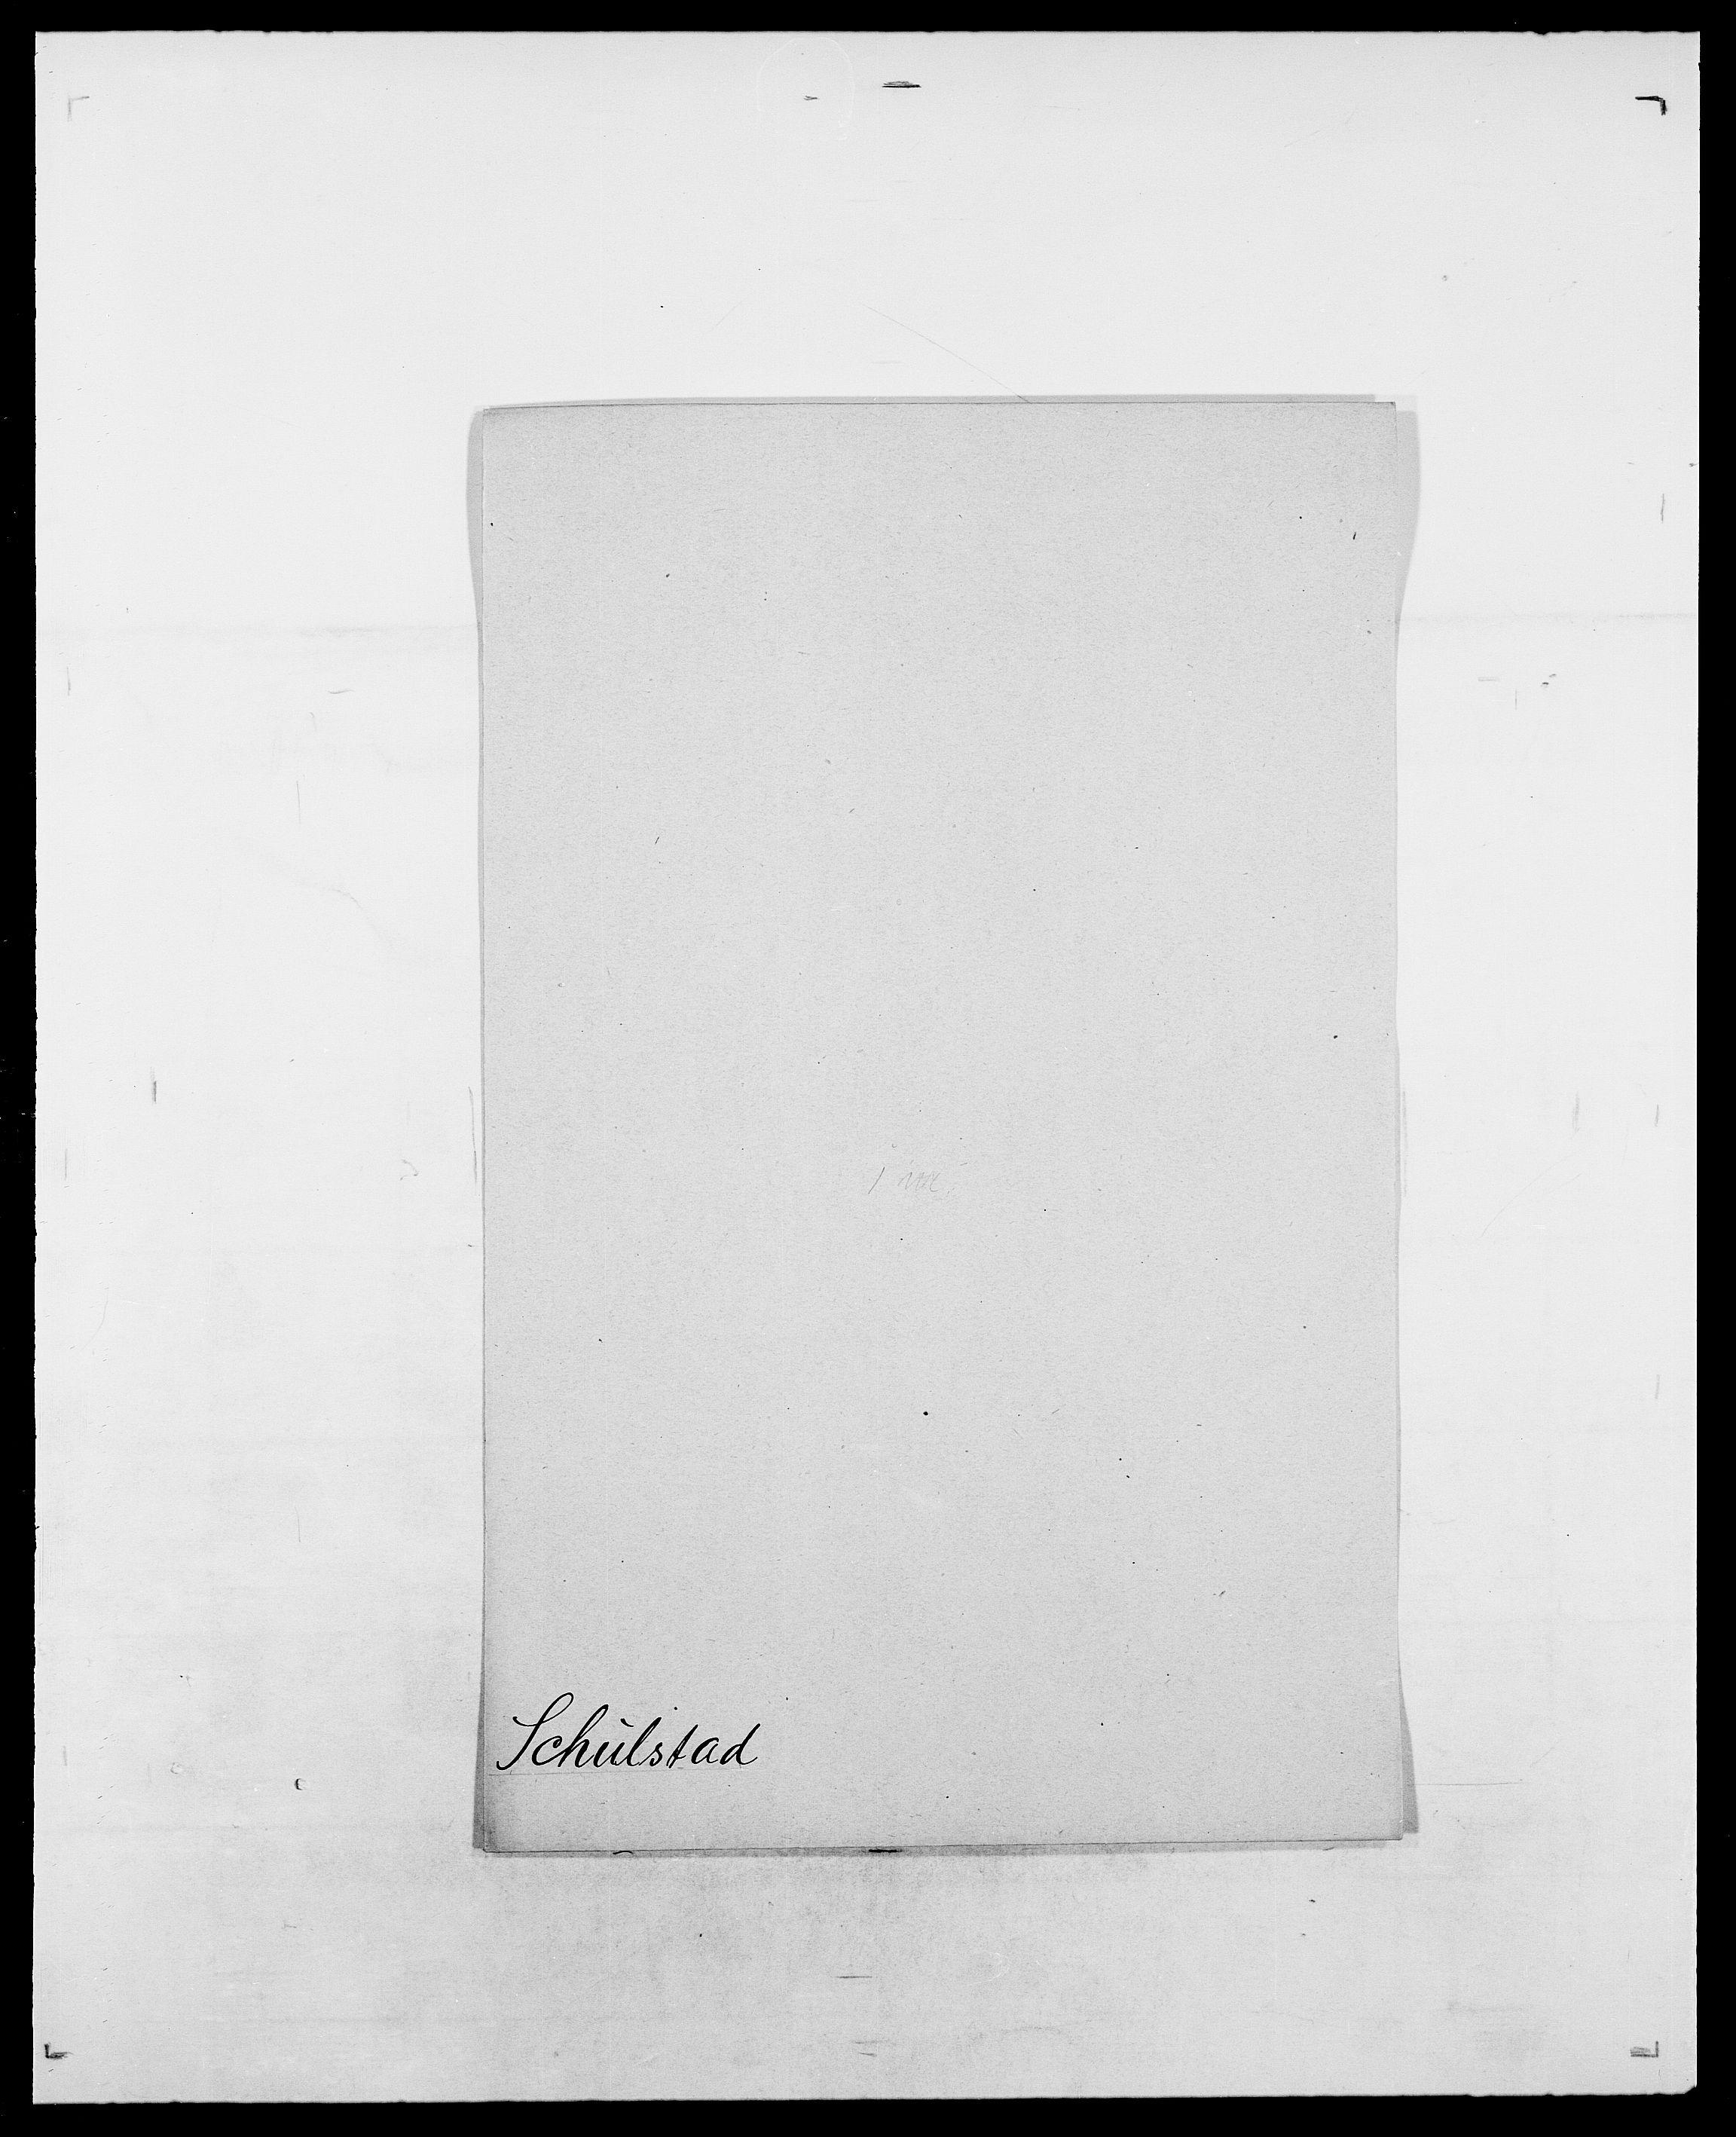 SAO, Delgobe, Charles Antoine - samling, D/Da/L0035: Schnabel - sjetman, s. 265